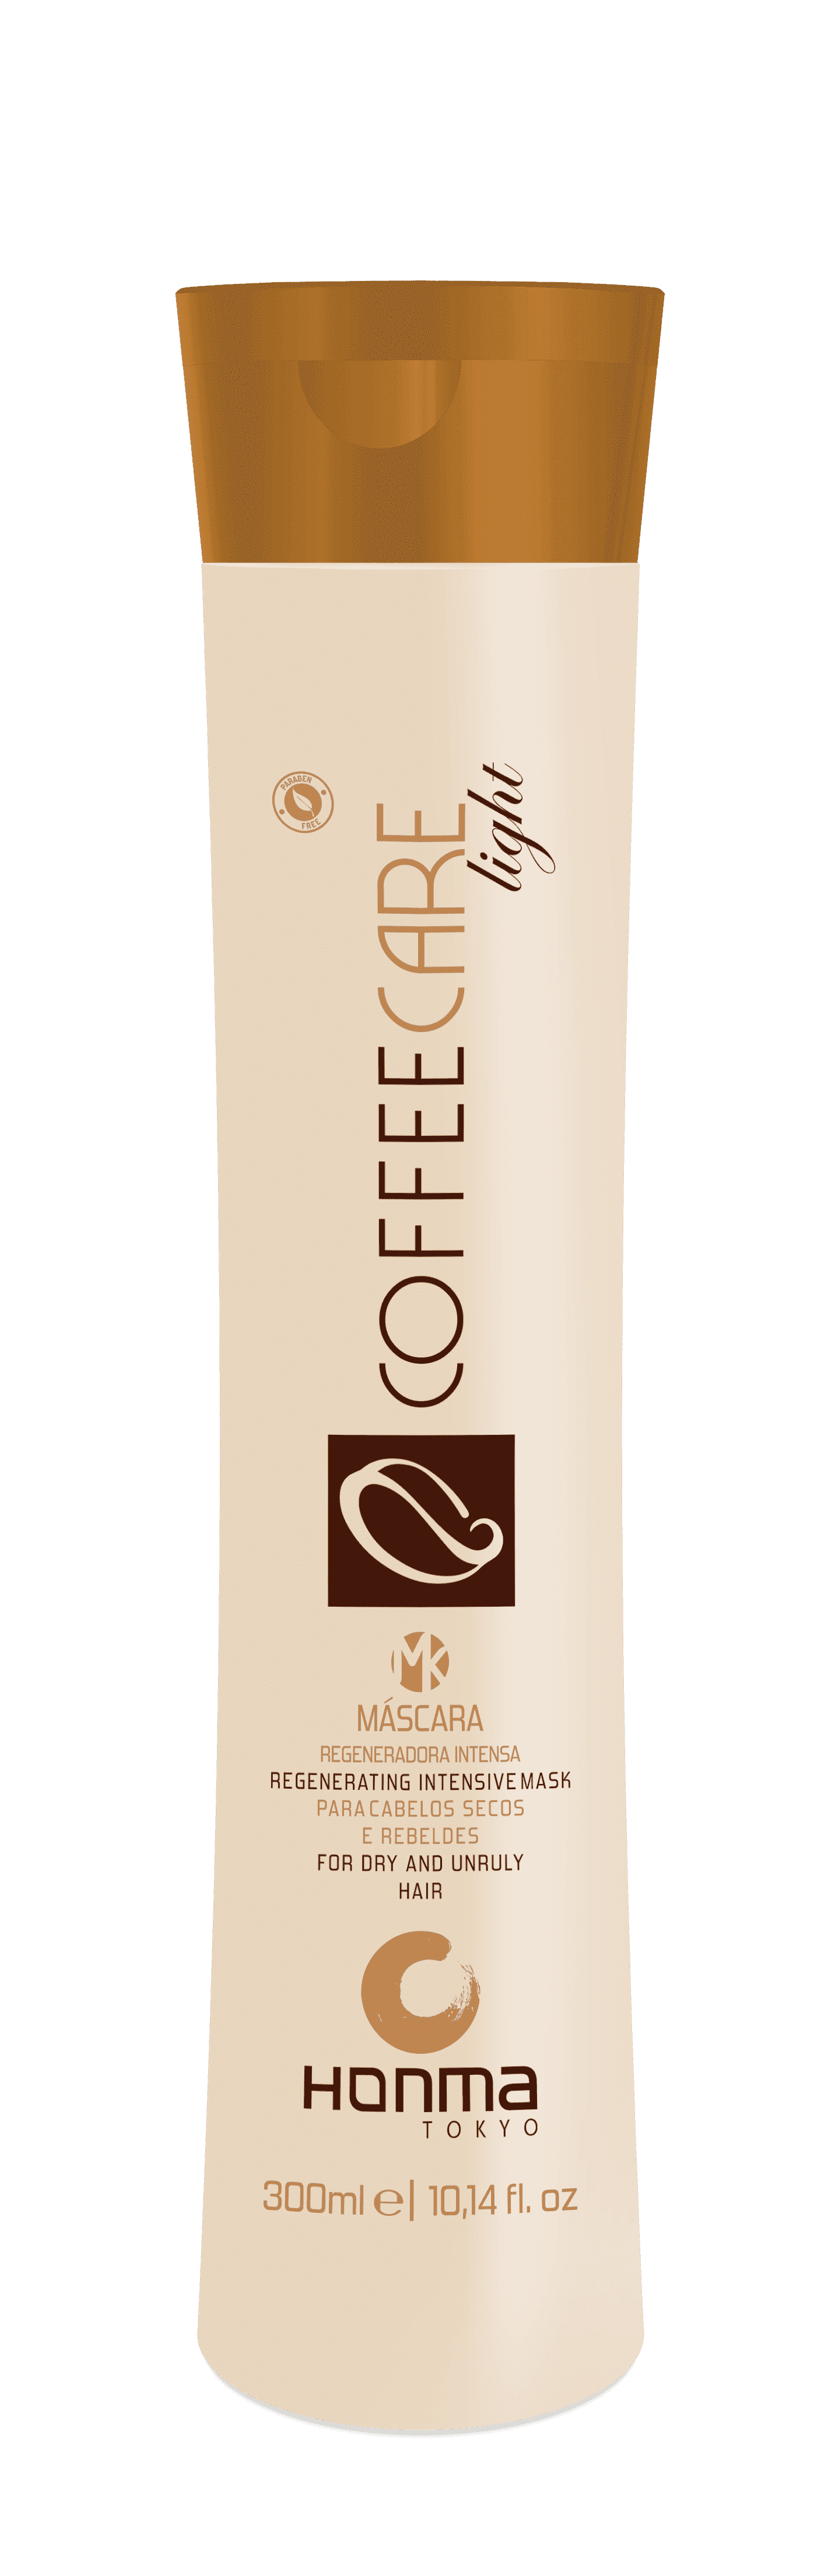 Honma Tokyo, Coffee Care Light Восстанавливающая интенсивная маска питание и укрепление, 300 млУход и лечение<br><br>